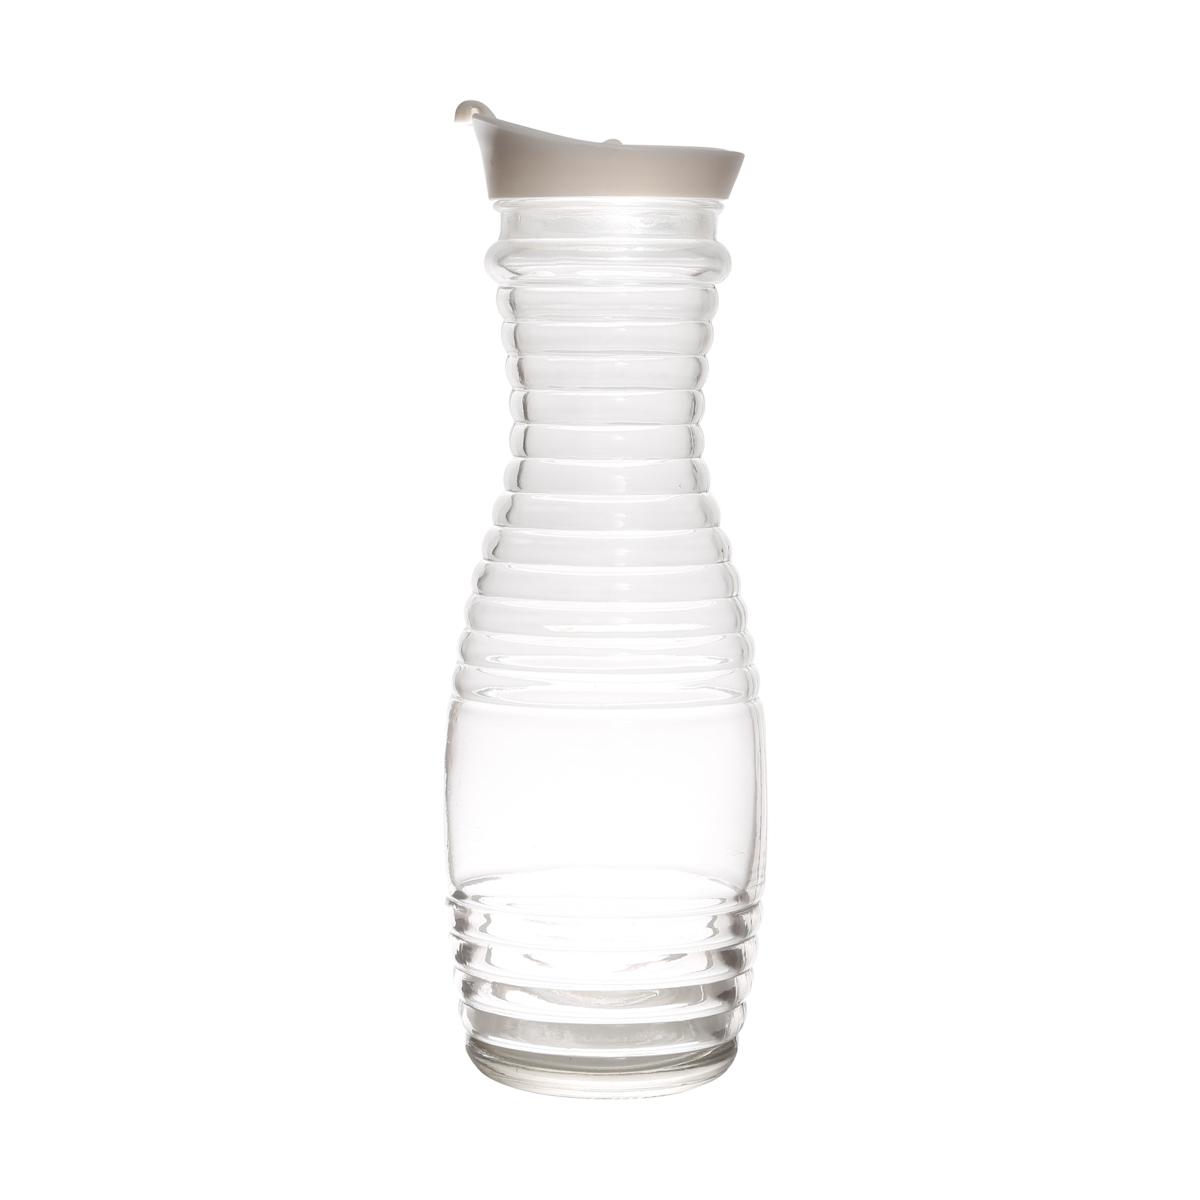 Jarra de Vidro 1L Sodo-Cálcico com Tampa Plástica Lyor  - Lemis